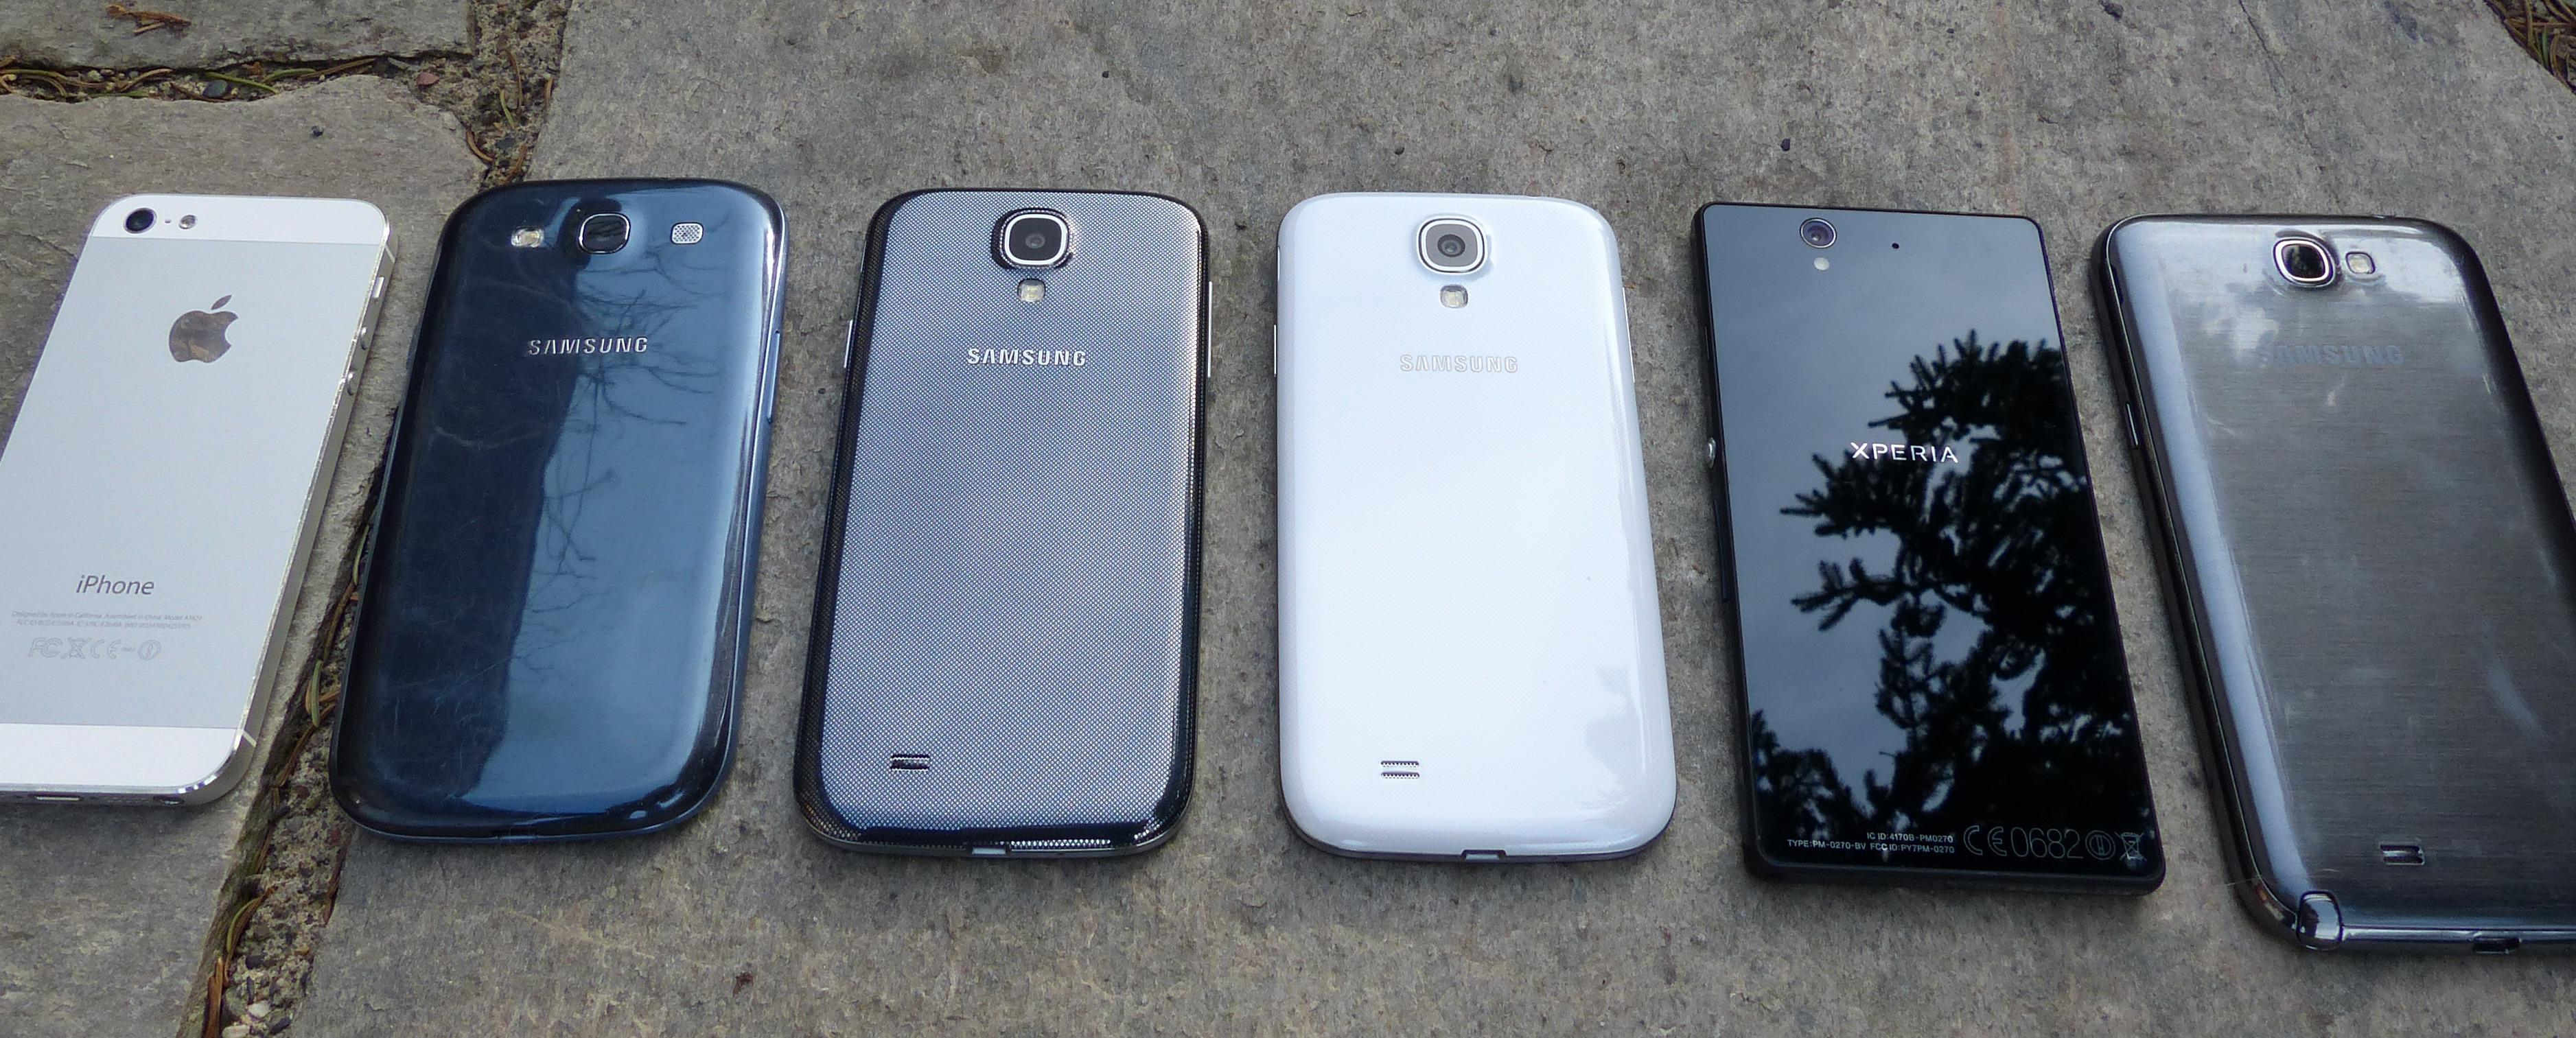 ... derfor tar vi med dette arkivbildet. iPhone 5 er akkurat like stor som iPhone 5S, og her ligger den sammen med blant annet Samsung Galaxy S4 og Sony Xperia Z.Foto: Finn Jarle Kvalheim, Amobil.no